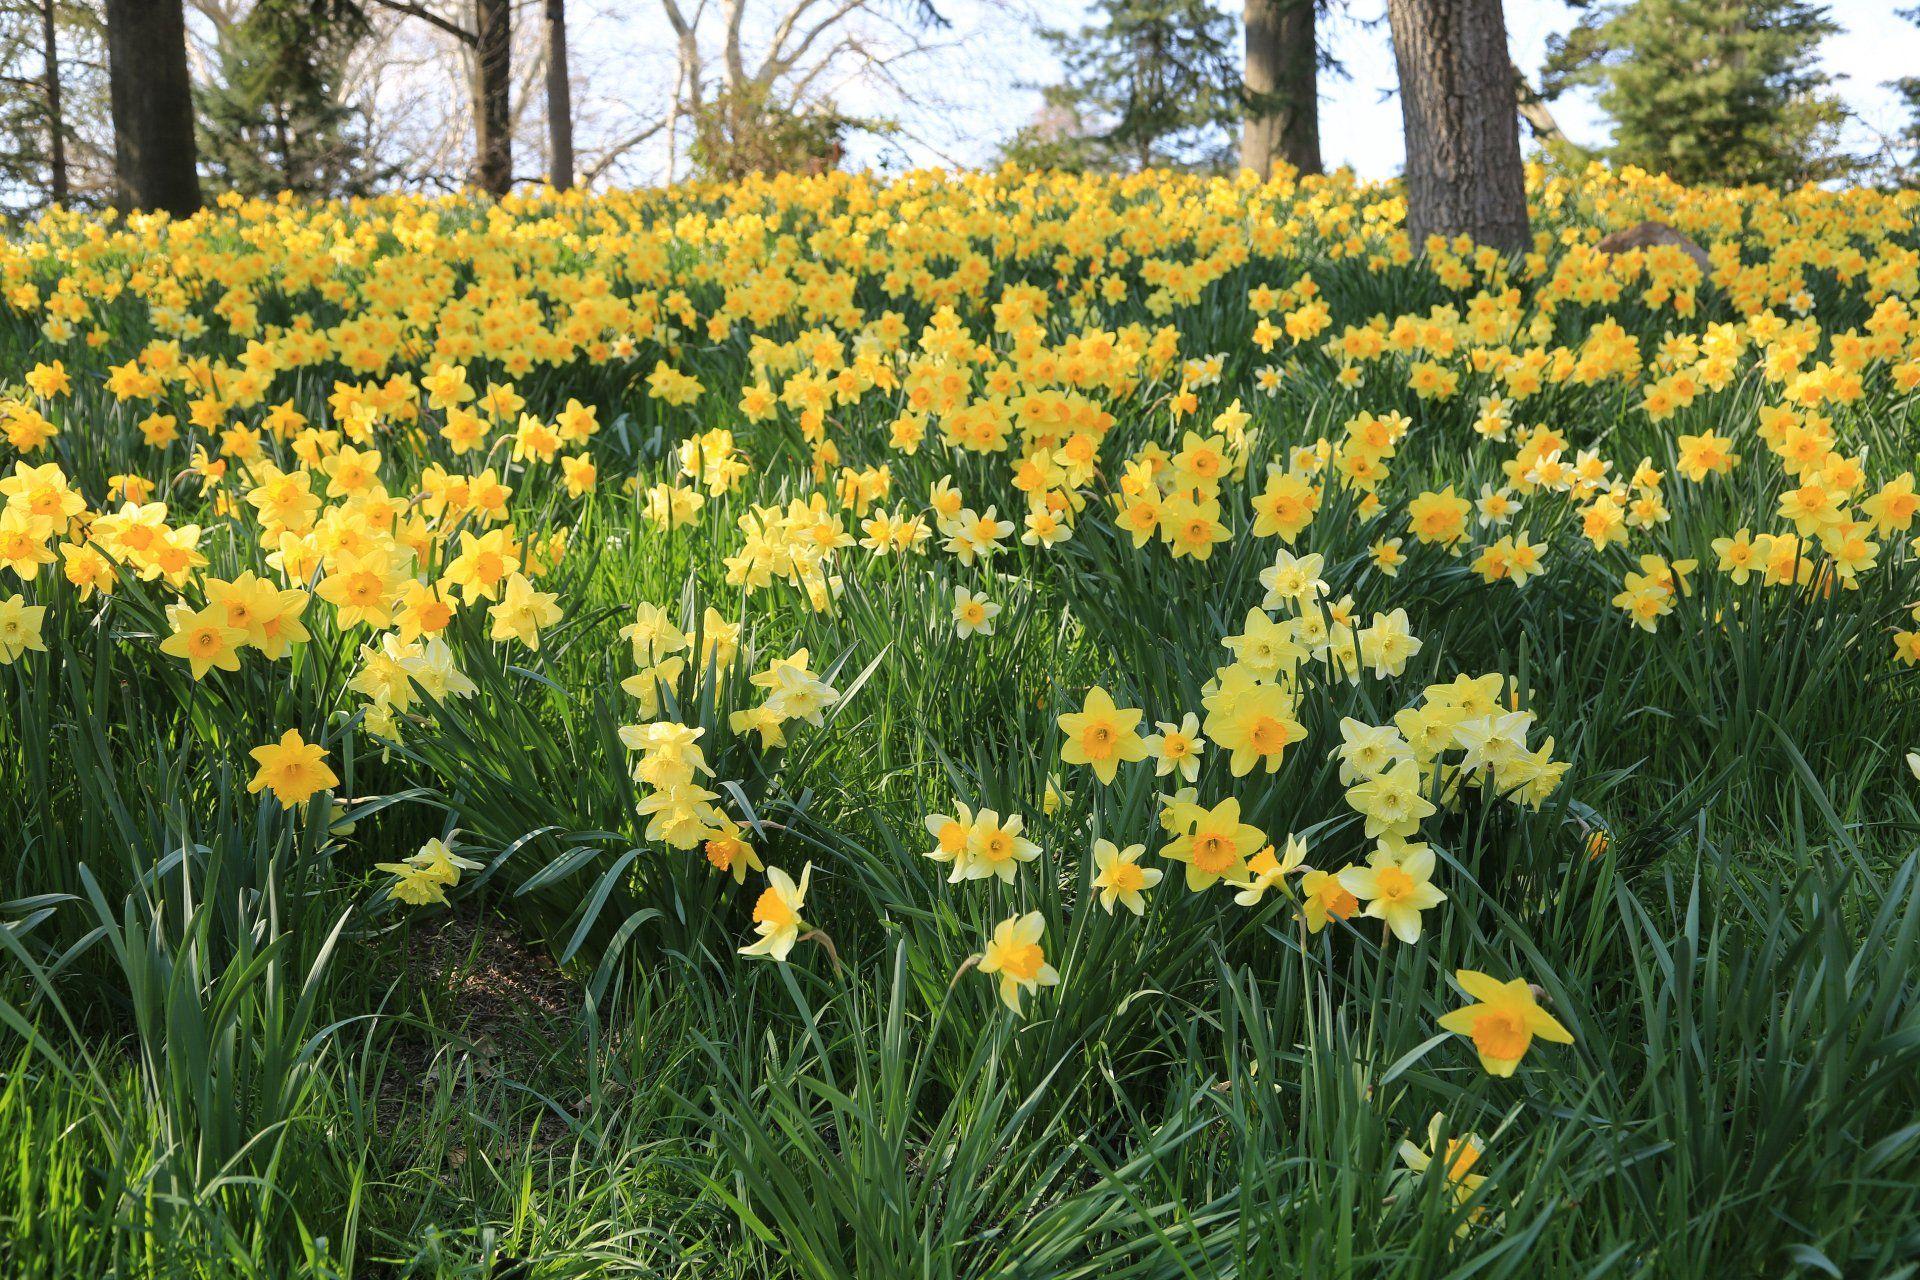 Tierra/Naturaleza Narciso  Tierra/Naturaleza Flor Narcissus Yellow Flower Campo Hierba Fondo de Pantalla